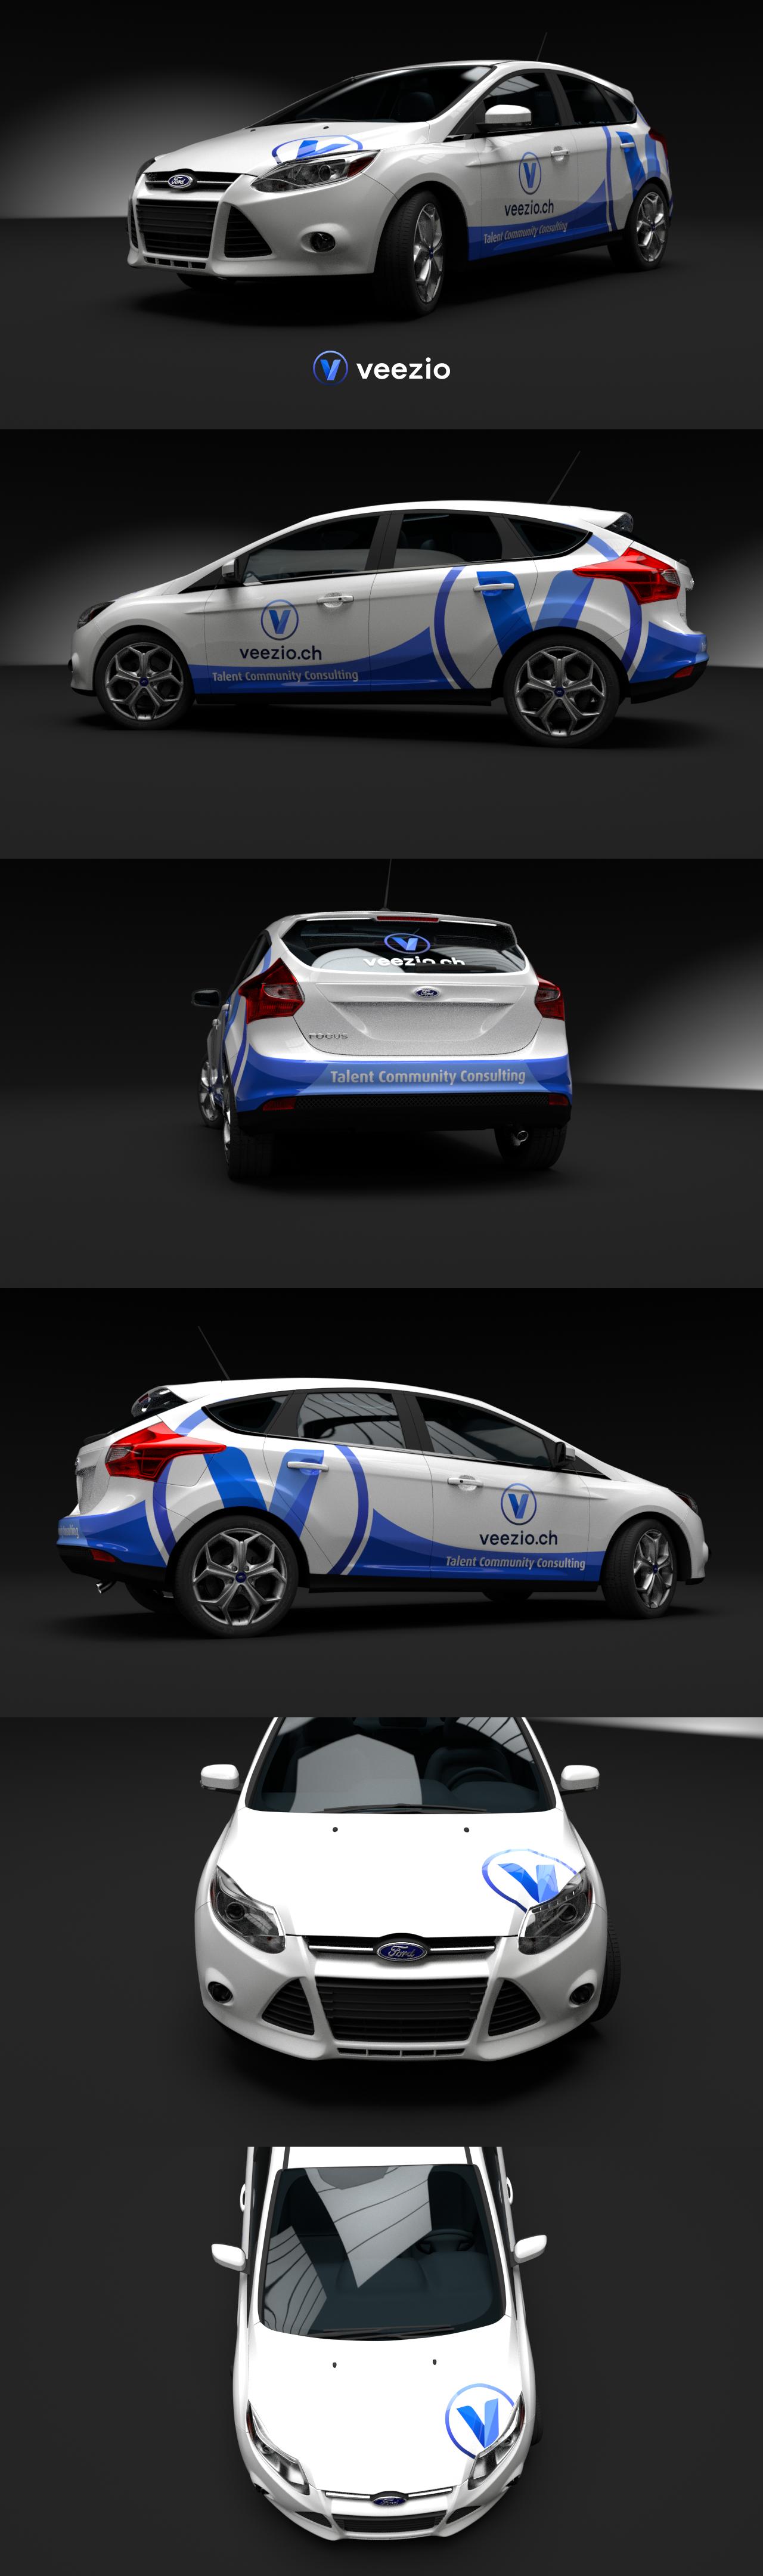 Original Design - Partial Vehicle Wrap